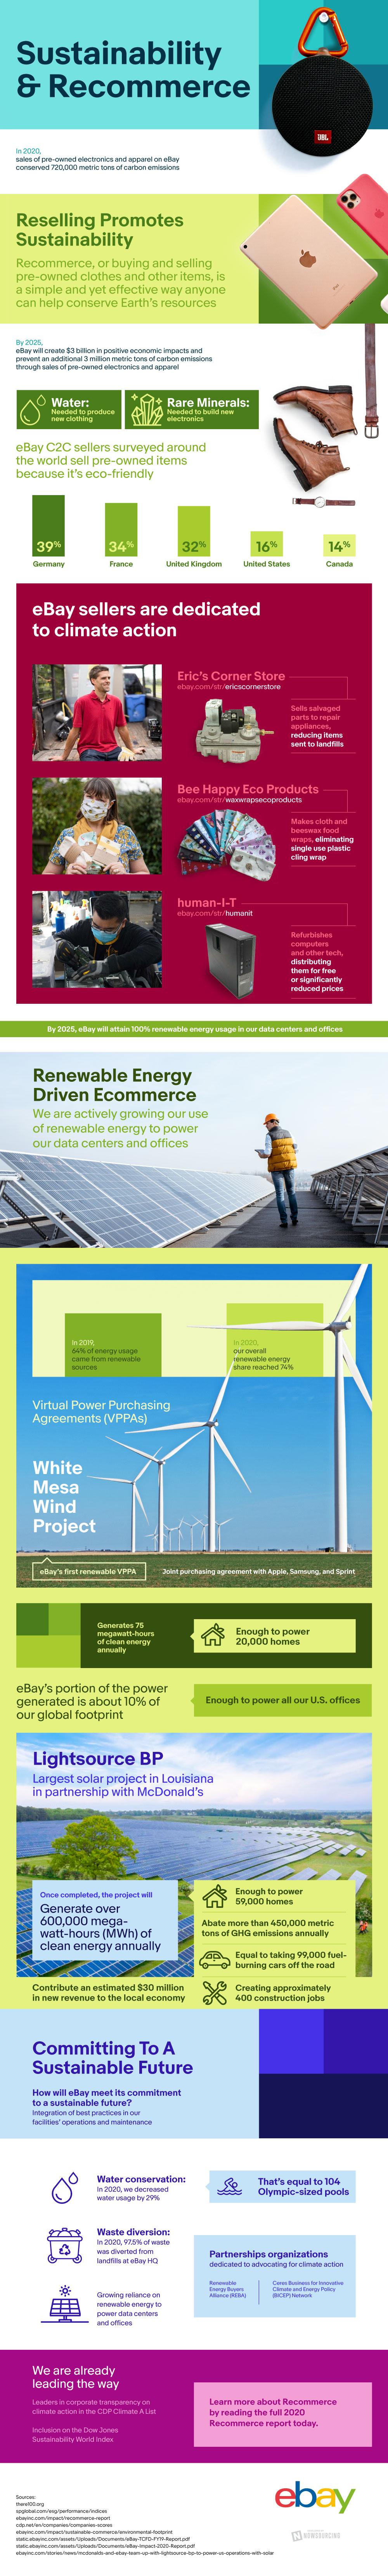 eBay sustainability and recommerce